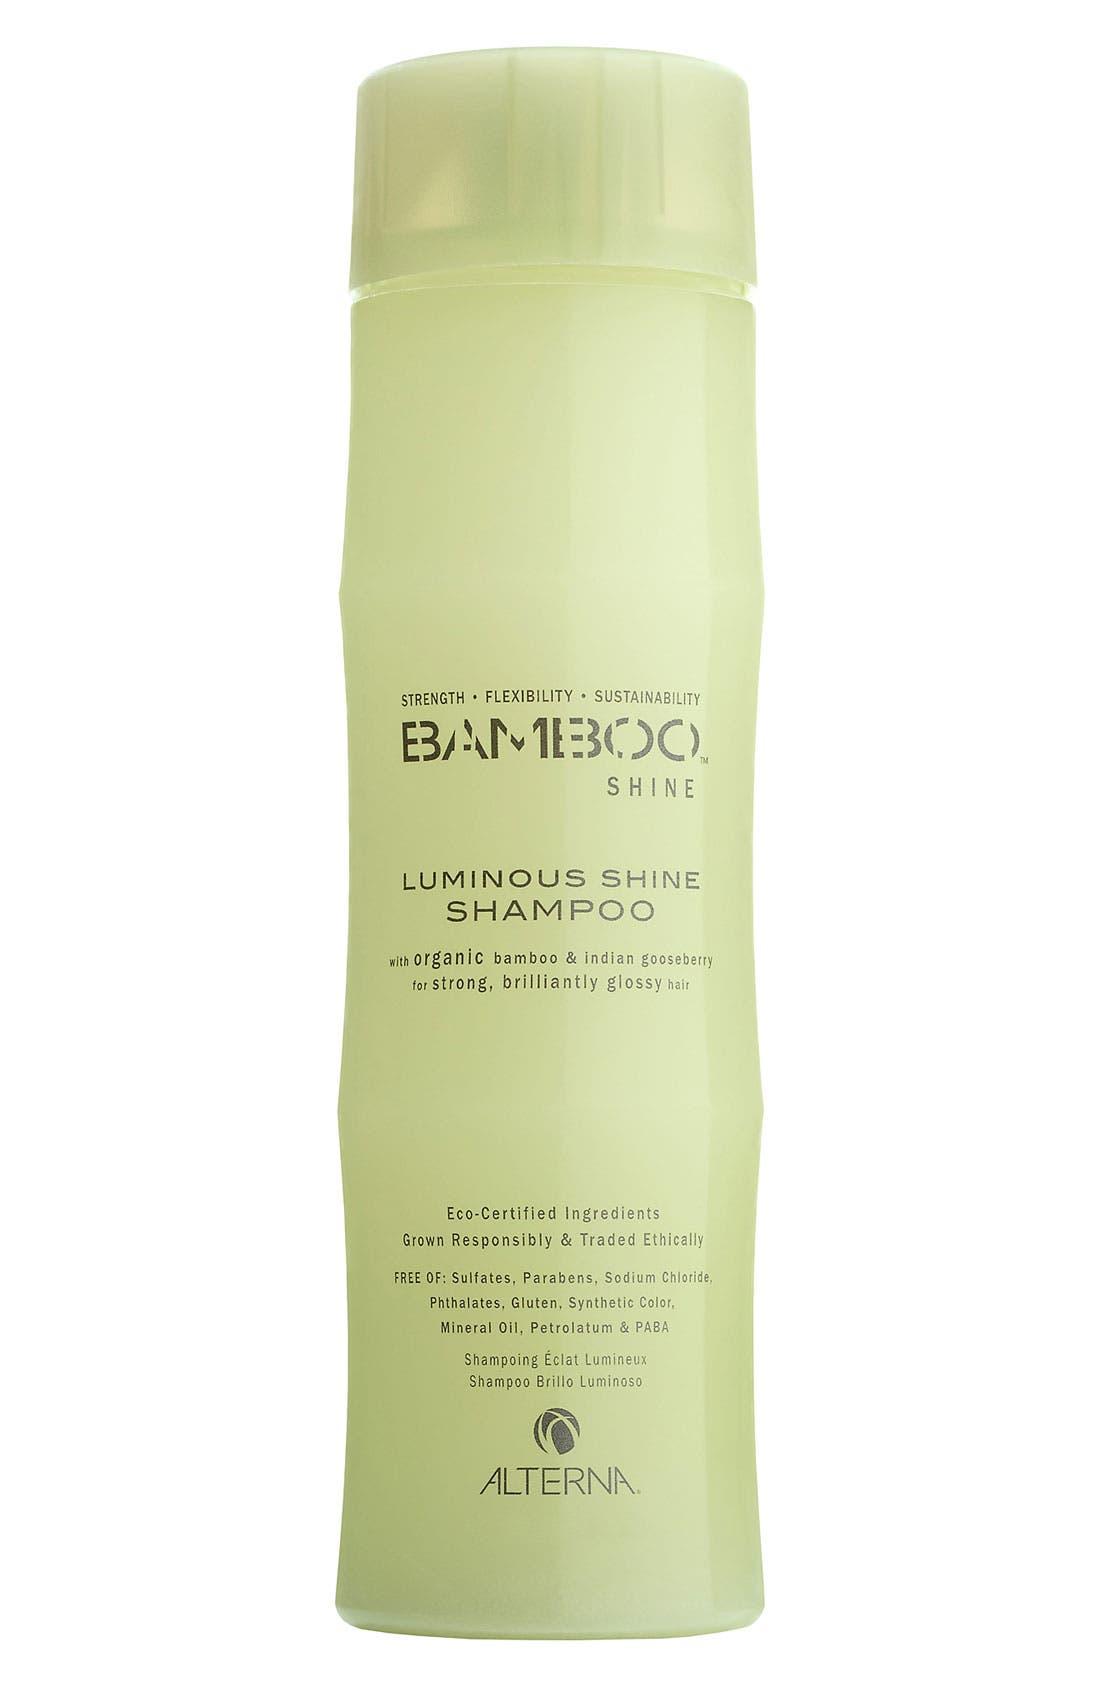 ALTERNA® Bamboo Shine Luminous Shine Shampoo